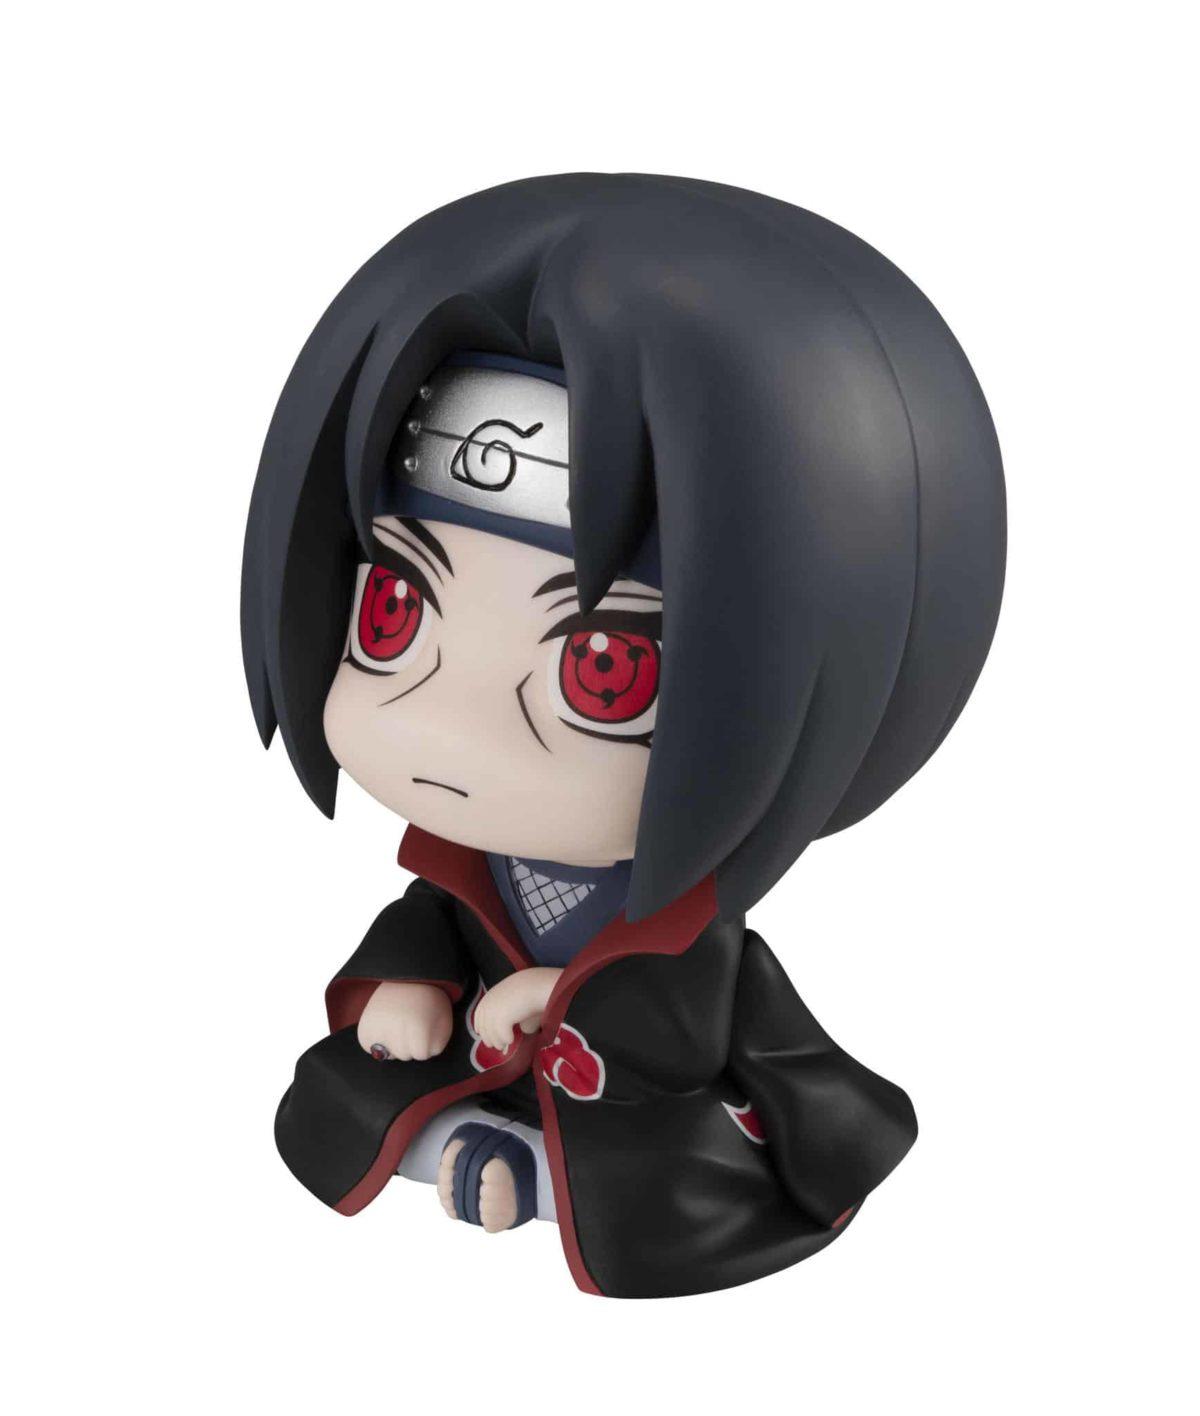 Naruto Shippuden Uchiha Itachi Lookup Series Figures 3